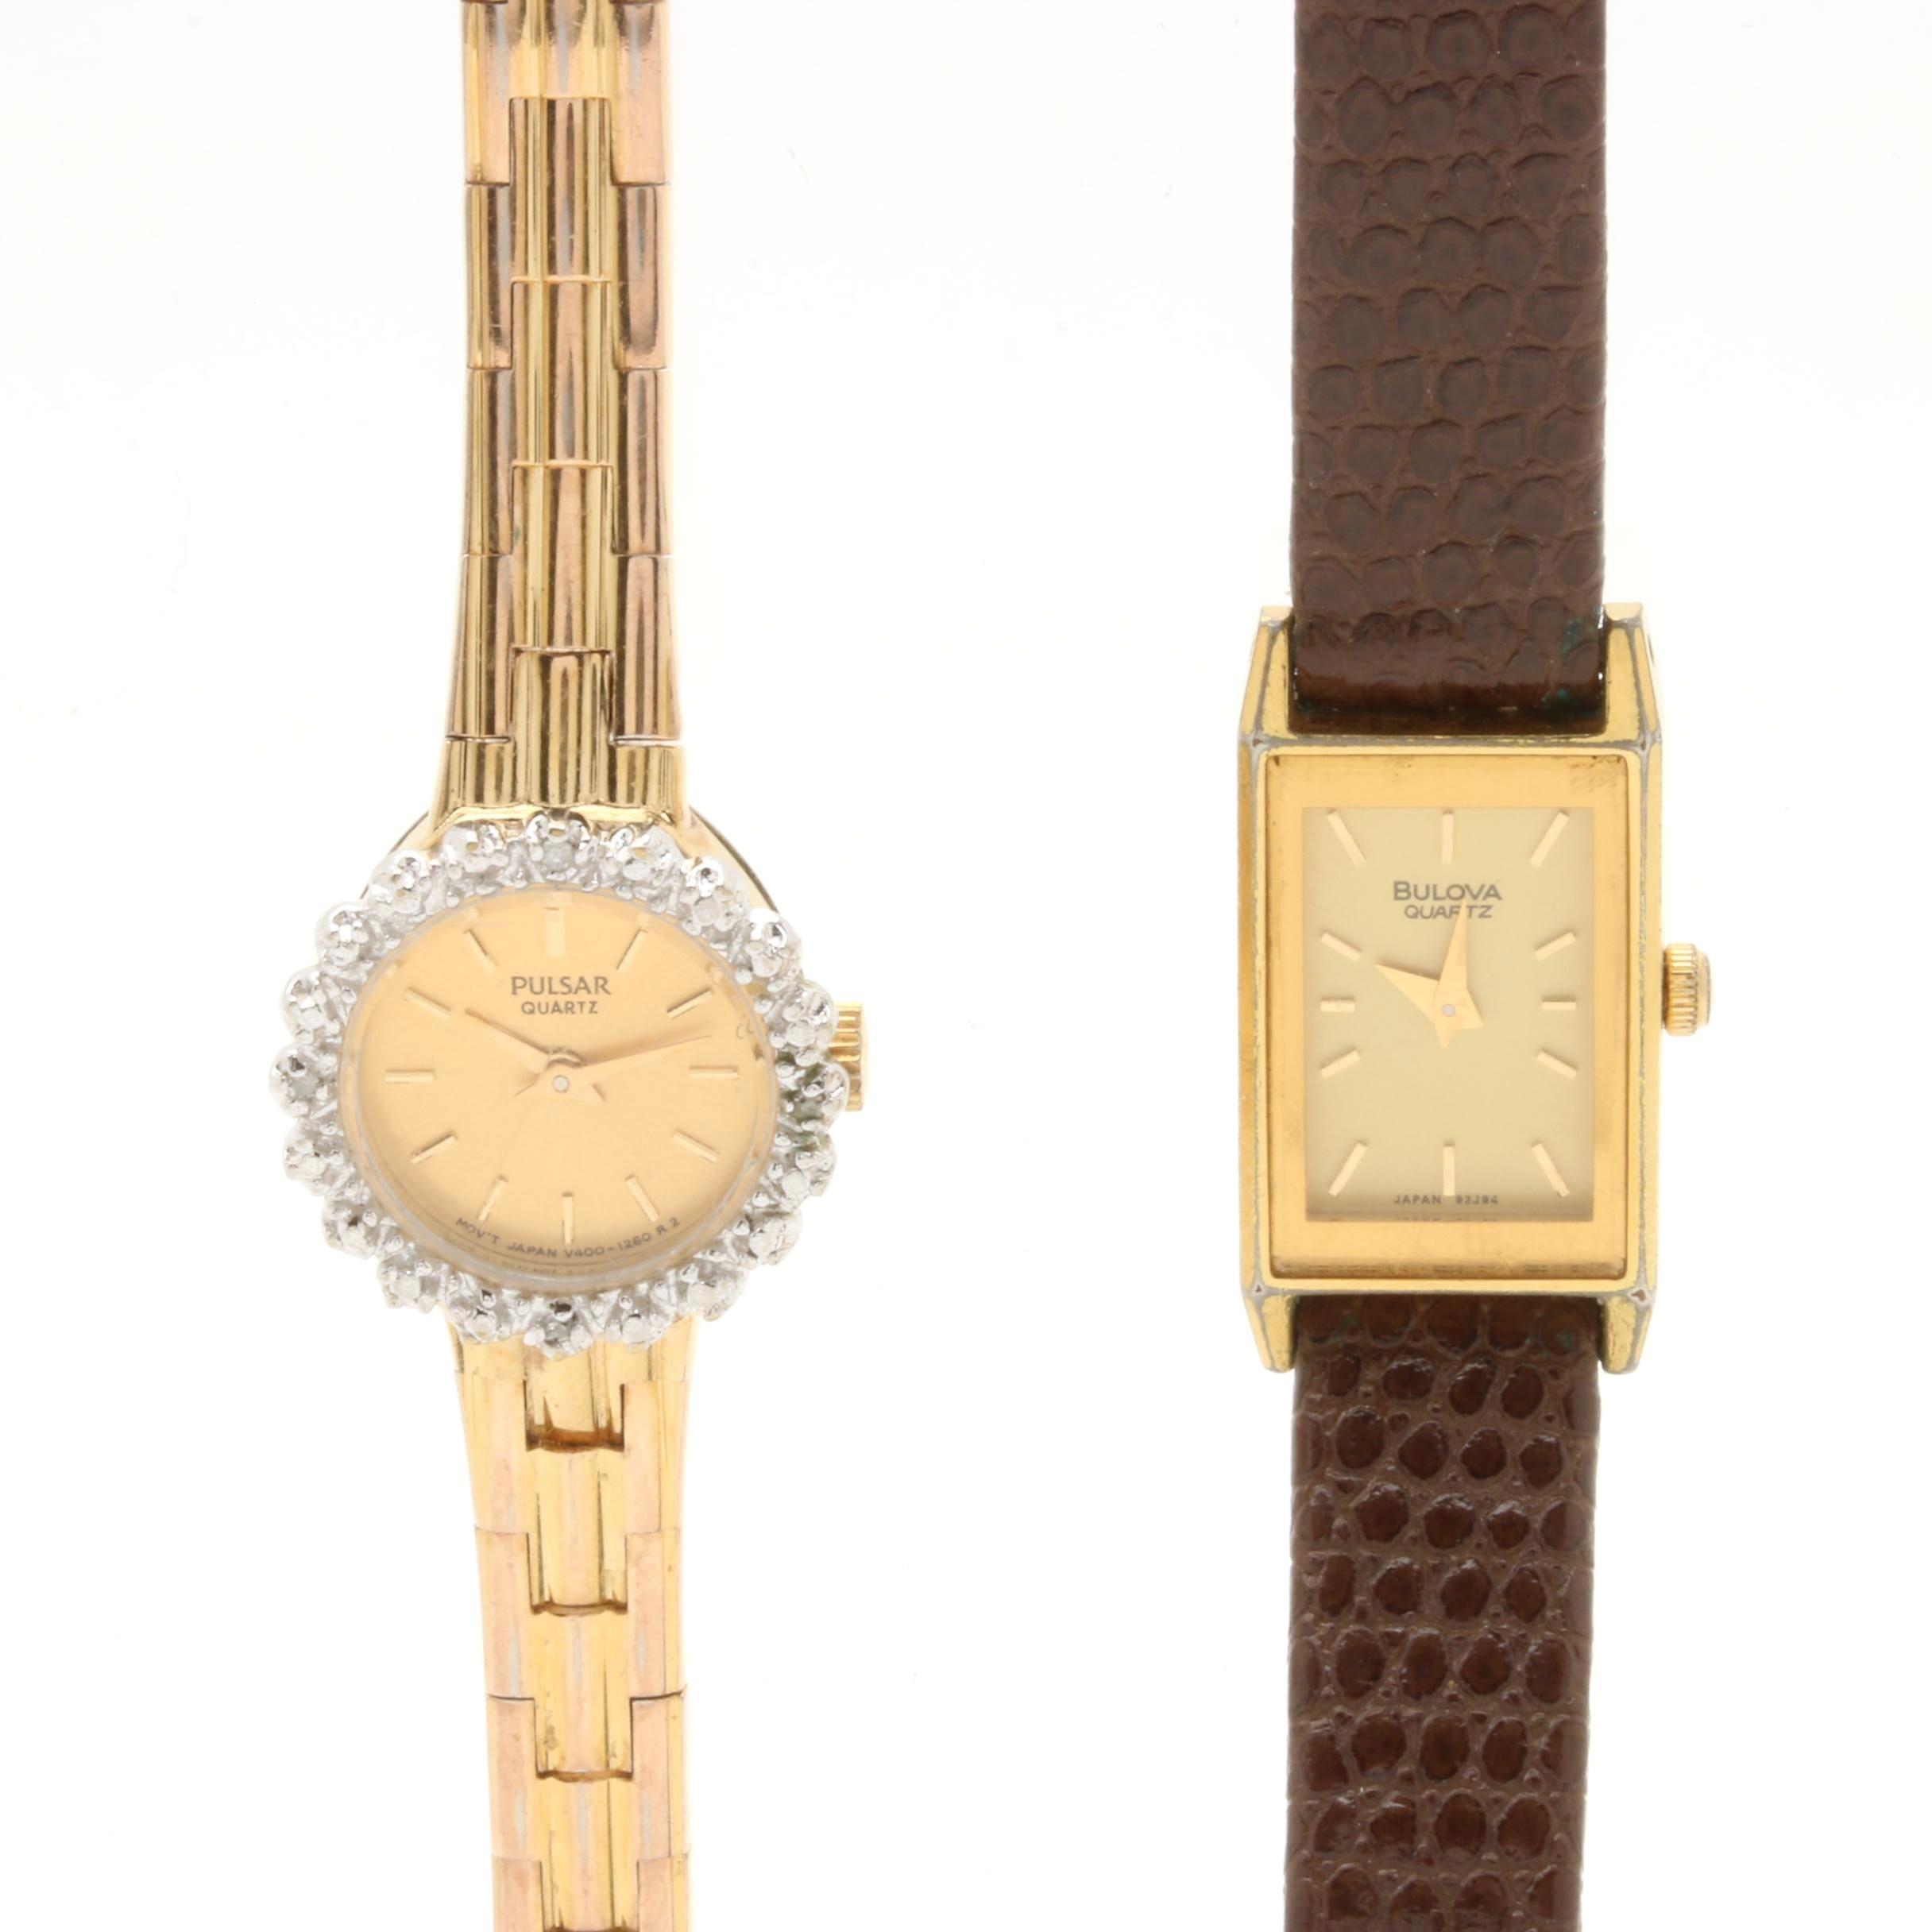 Pulsar and Bulova Gold Tone Diamond Wriswatches